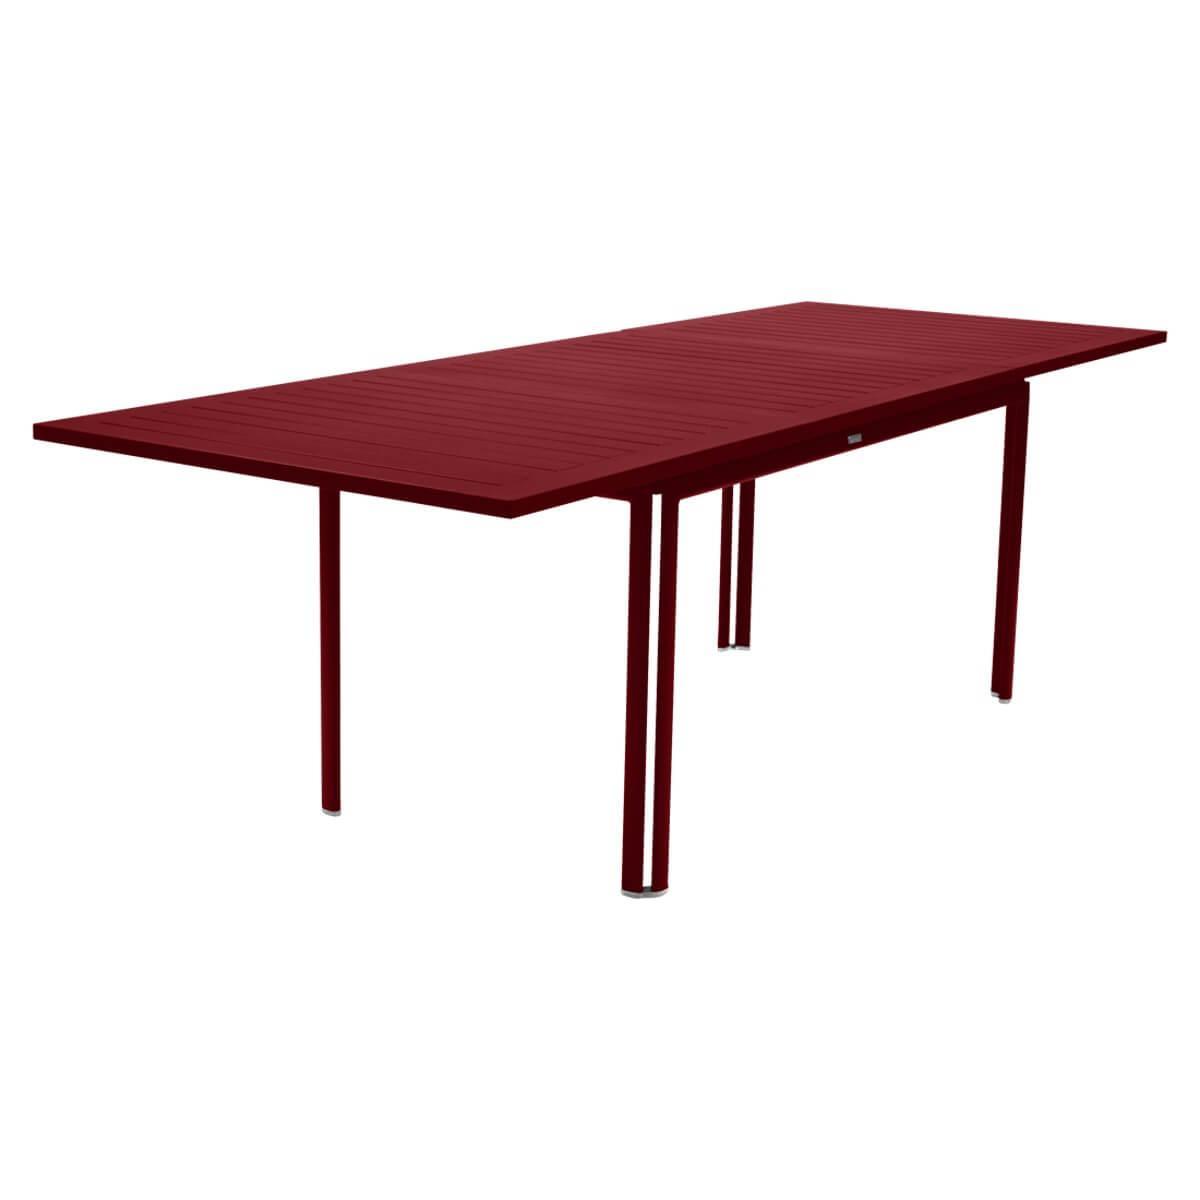 Table à rallonge 90x160/240cm COSTA Fermob piment